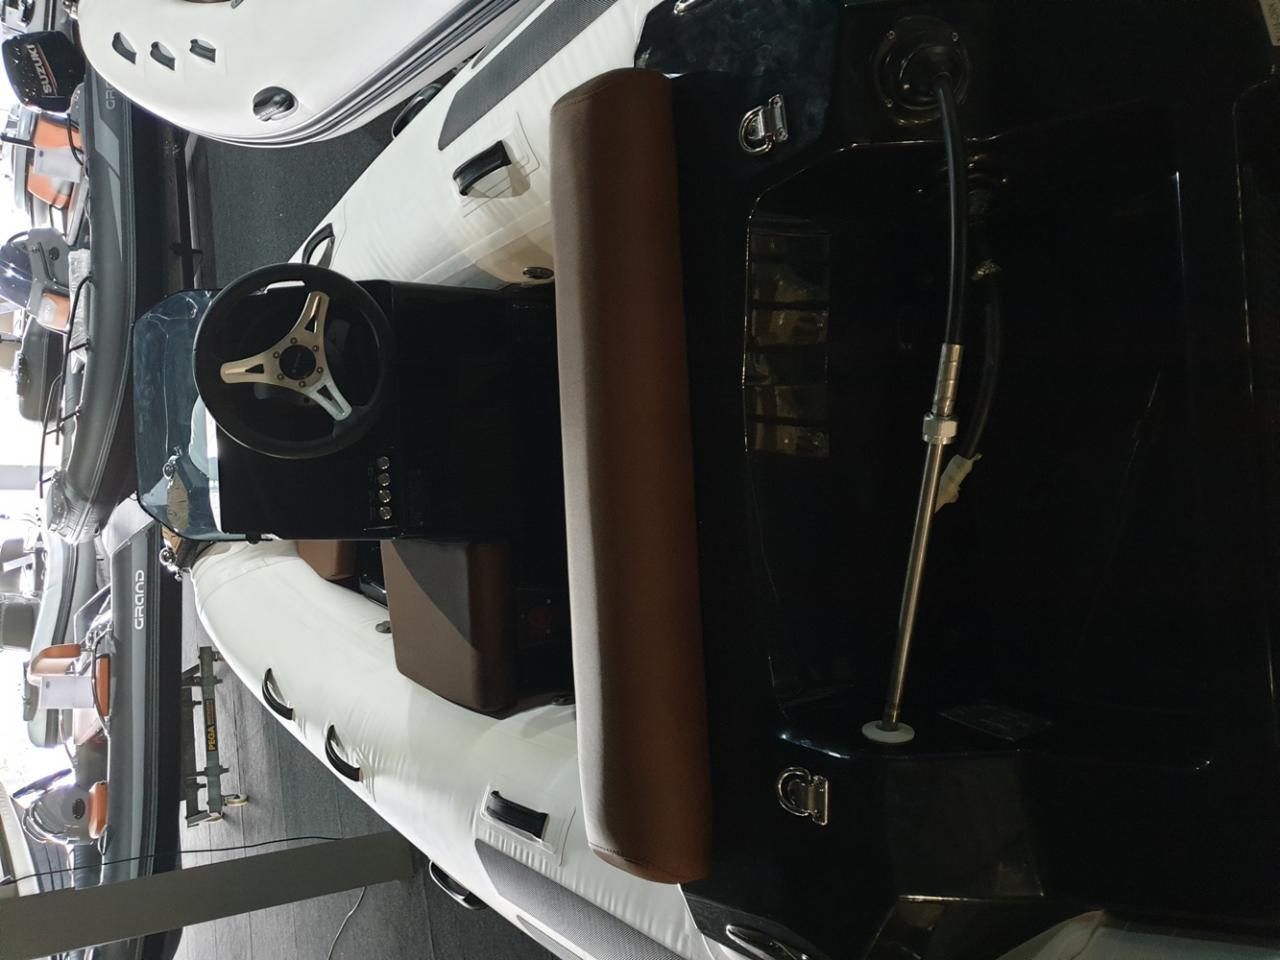 Brig Eagle 3.5 rib met Suzuki 30 pk 4